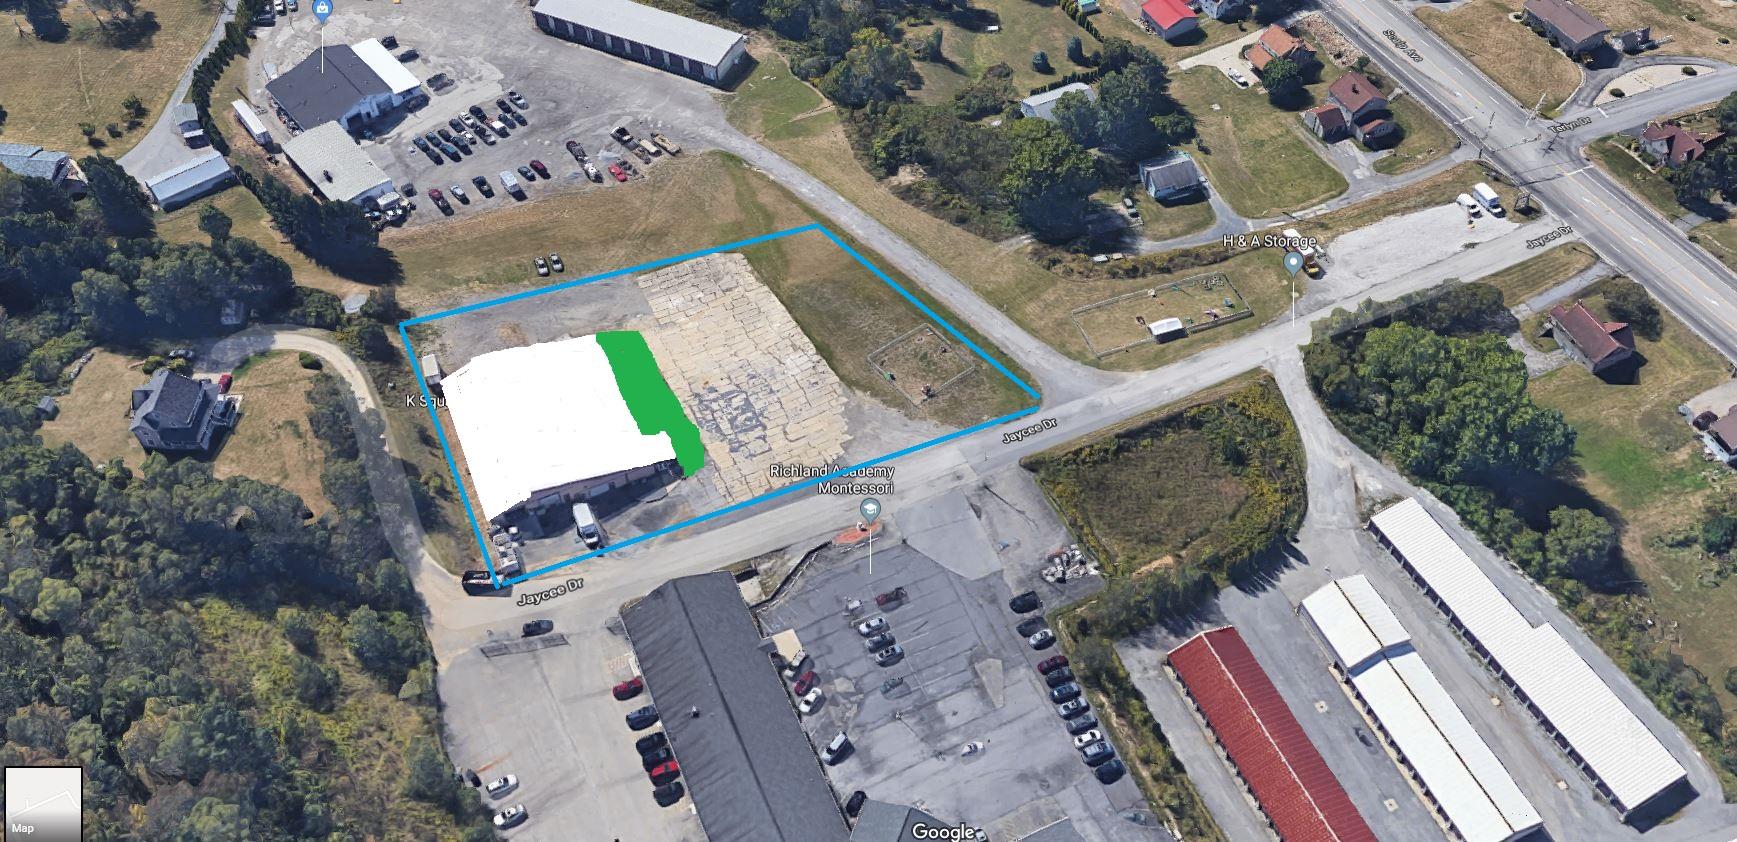 143 jaycee Drive Google Earth.JPG